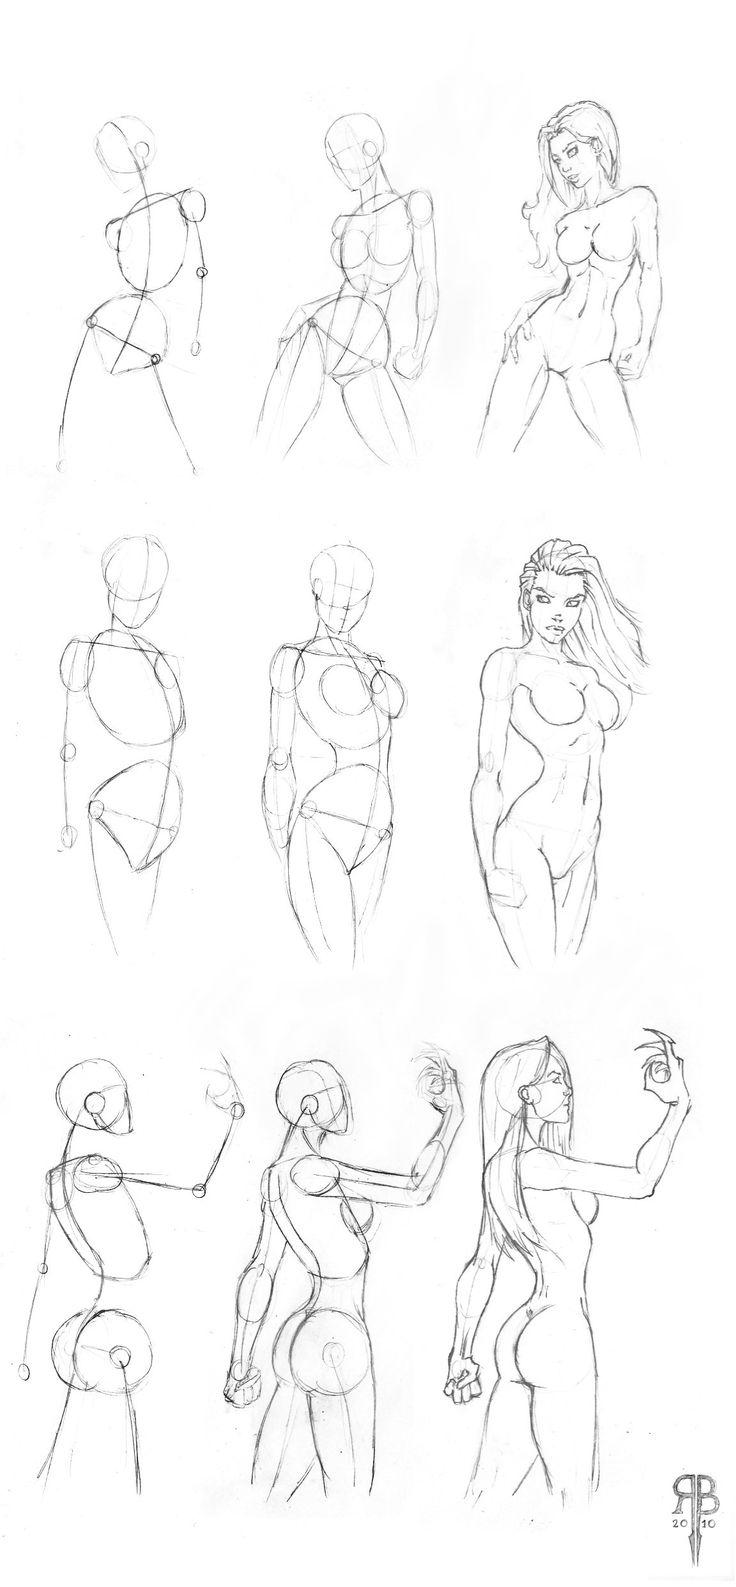 female_body_shapes_part_2_by_rofelrolf-d3571u1.jpg (1152×2484)